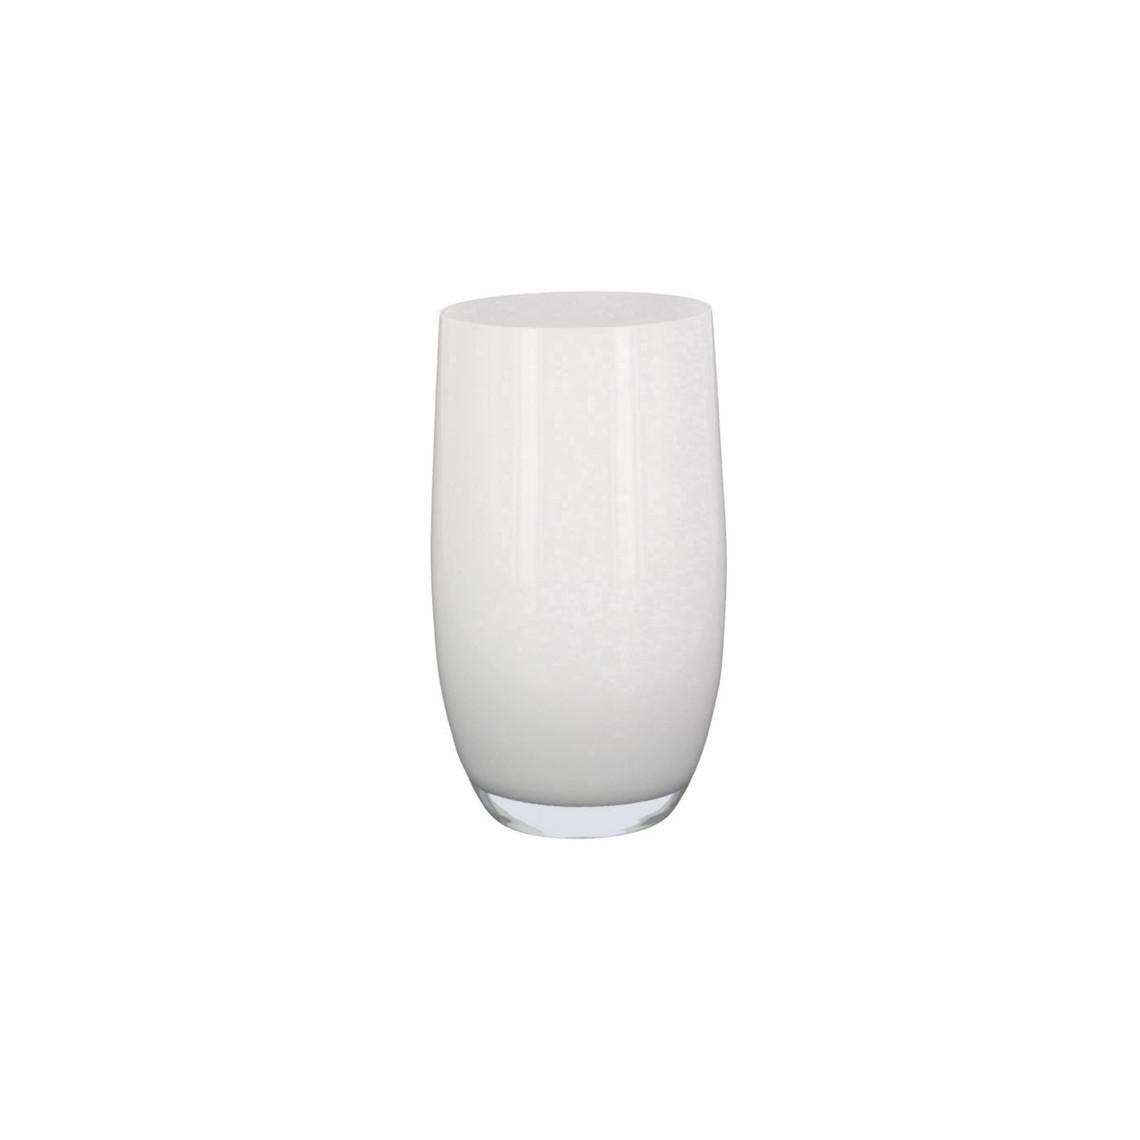 Gobelet Fantaisie blanc (33 cl)